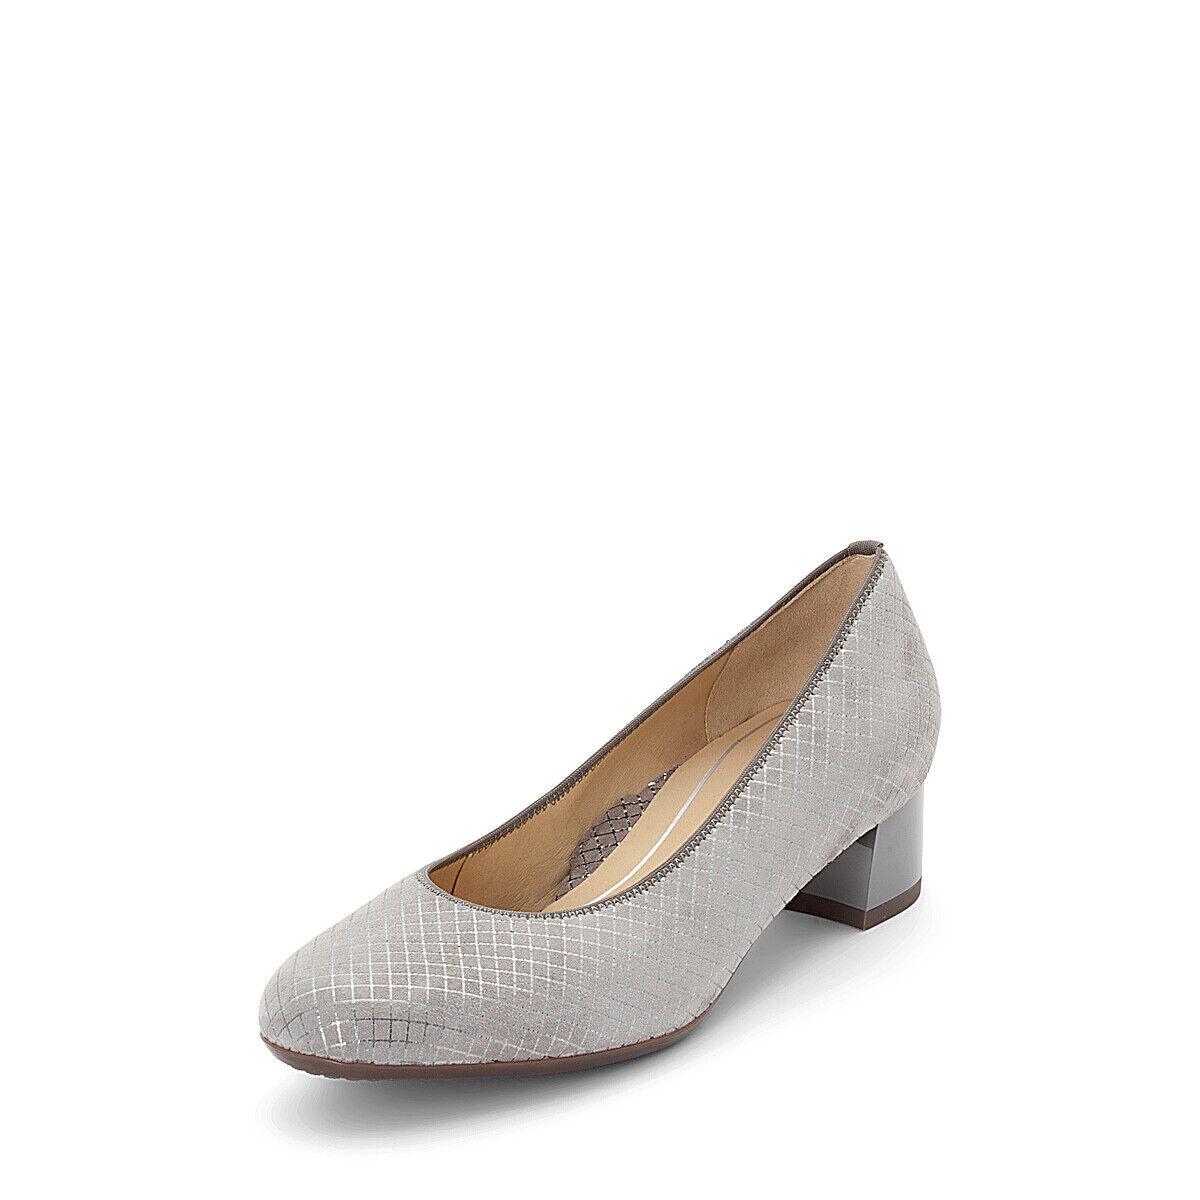 Ara Chaussures Femmes Escarpins fumée squarekid Vicenza-highsoft G-Largeur 12-16601-11